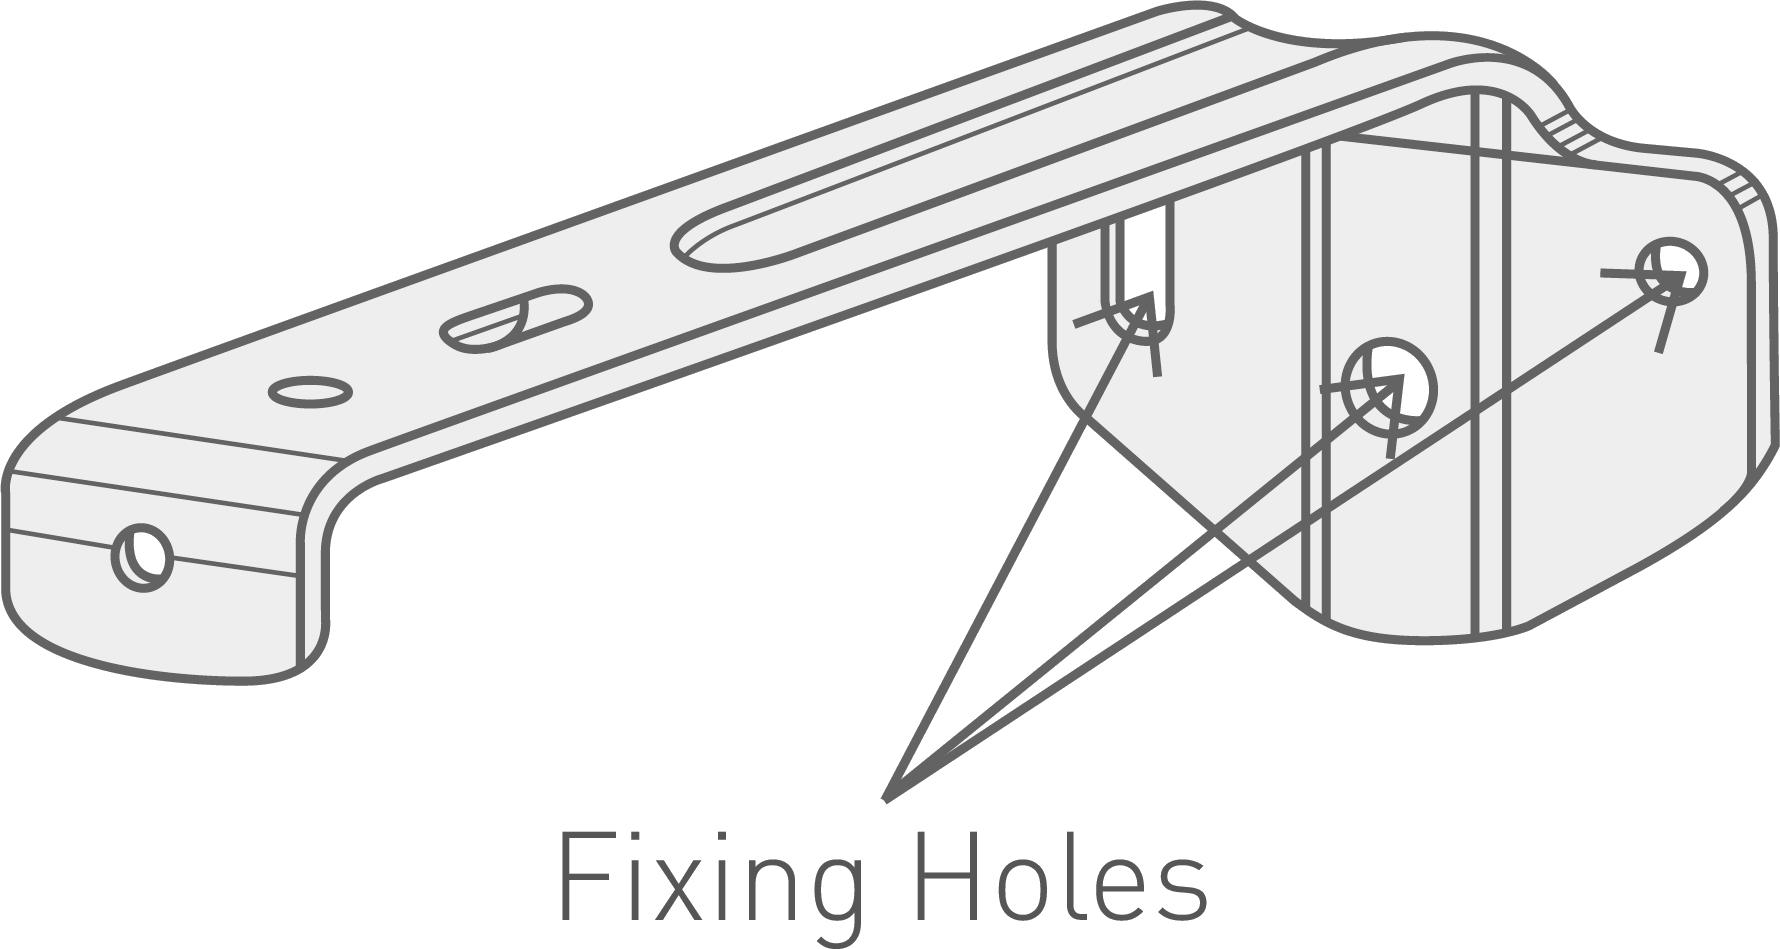 A closeup drawing on a vertical blind bracket